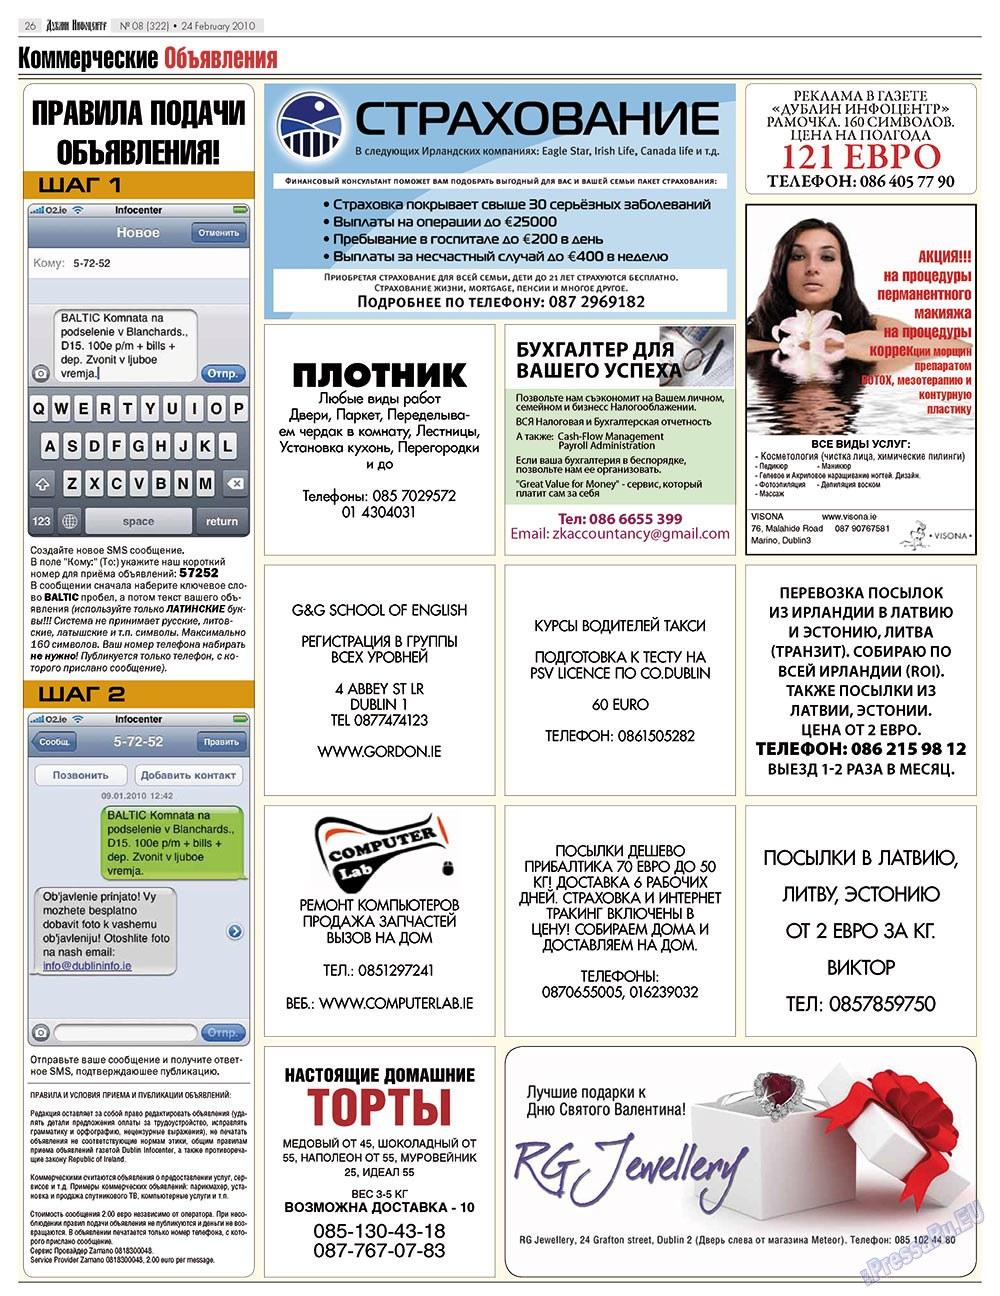 Дублин инфоцентр (газета). 2010 год, номер 8, стр. 26